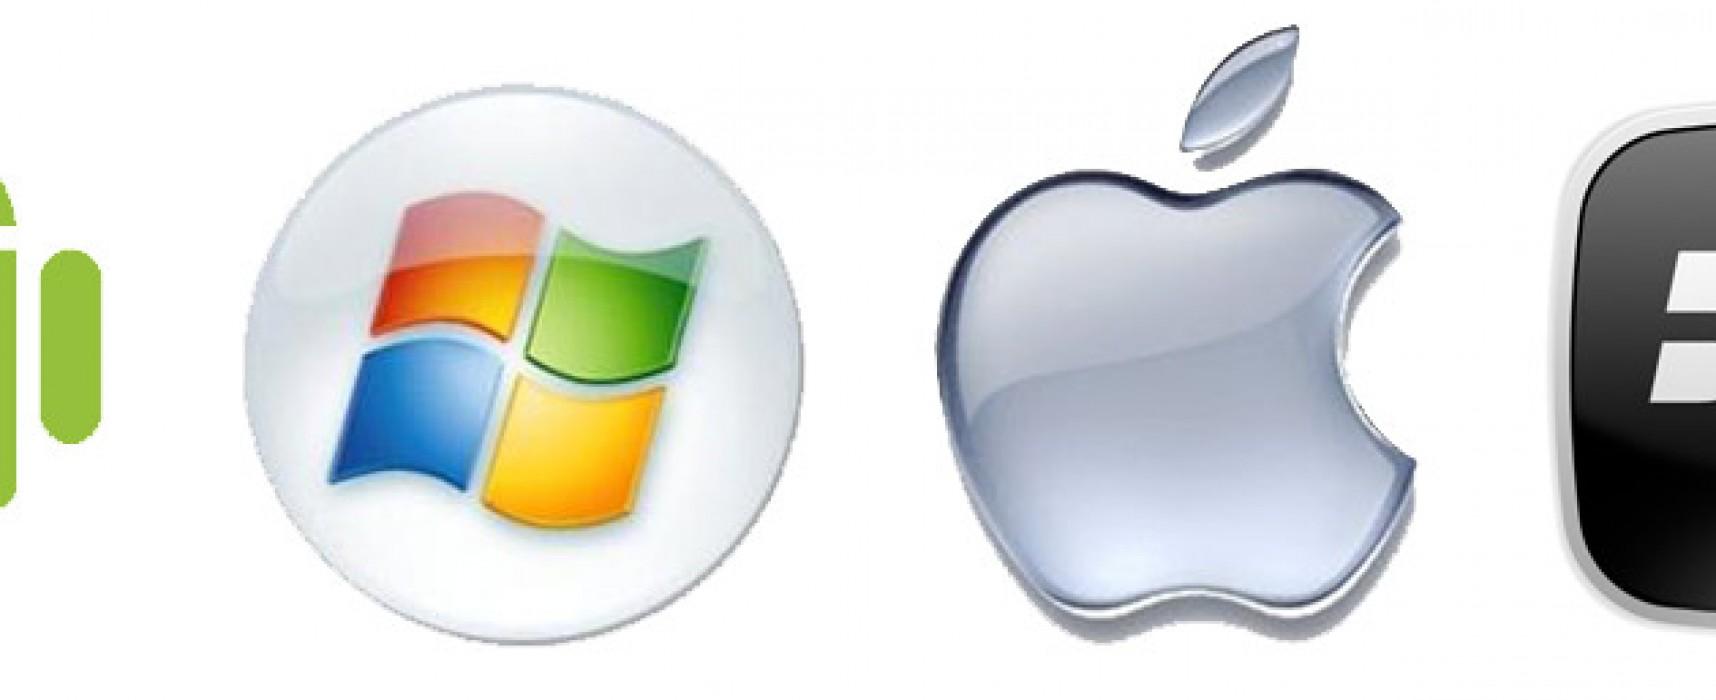 android vs iOS vs Windows vs Blackberry